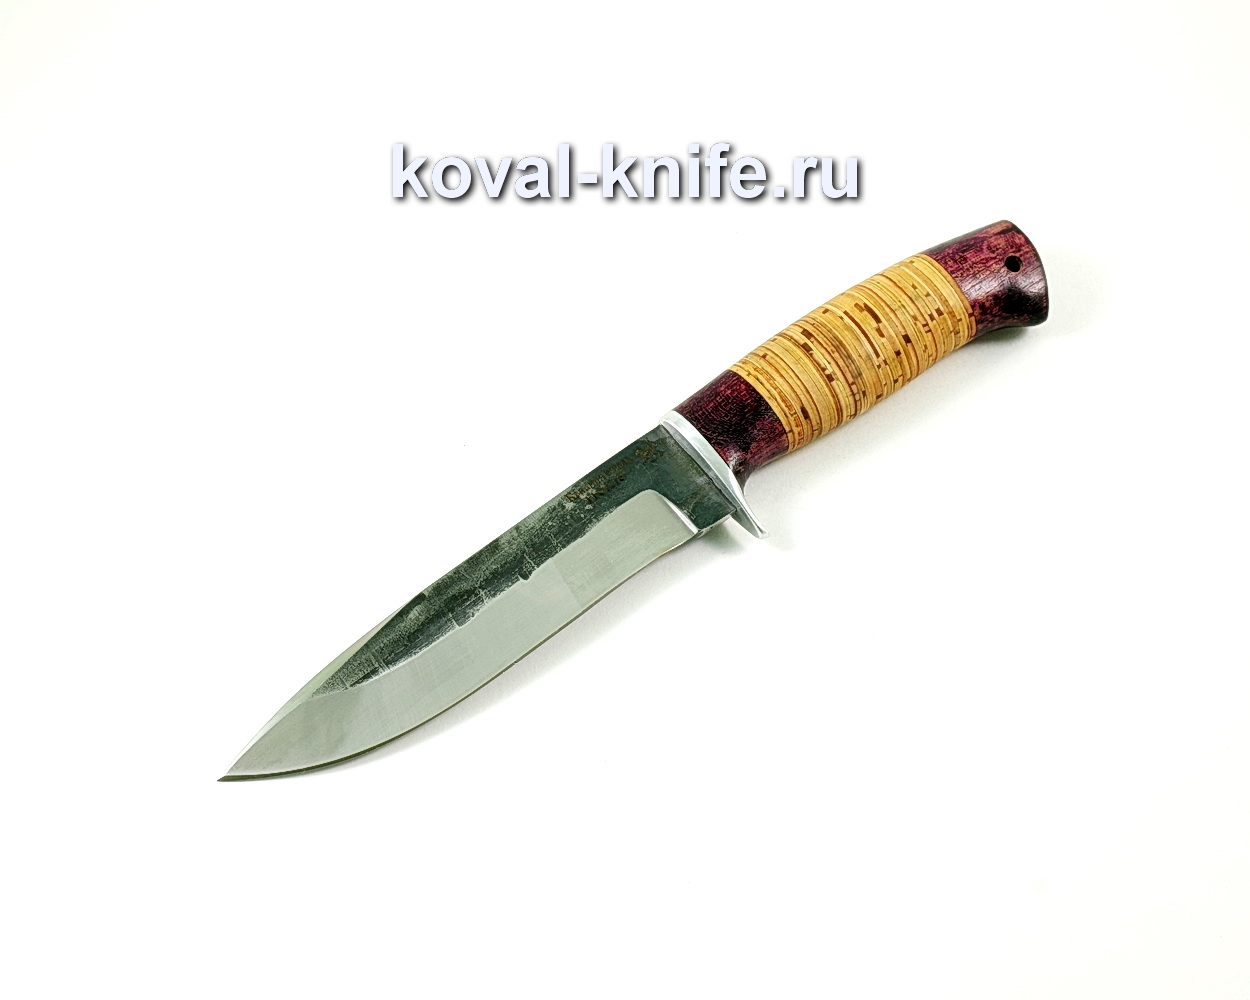 Нож олимп (сталь 110х18), рукоять береста, амарант A222